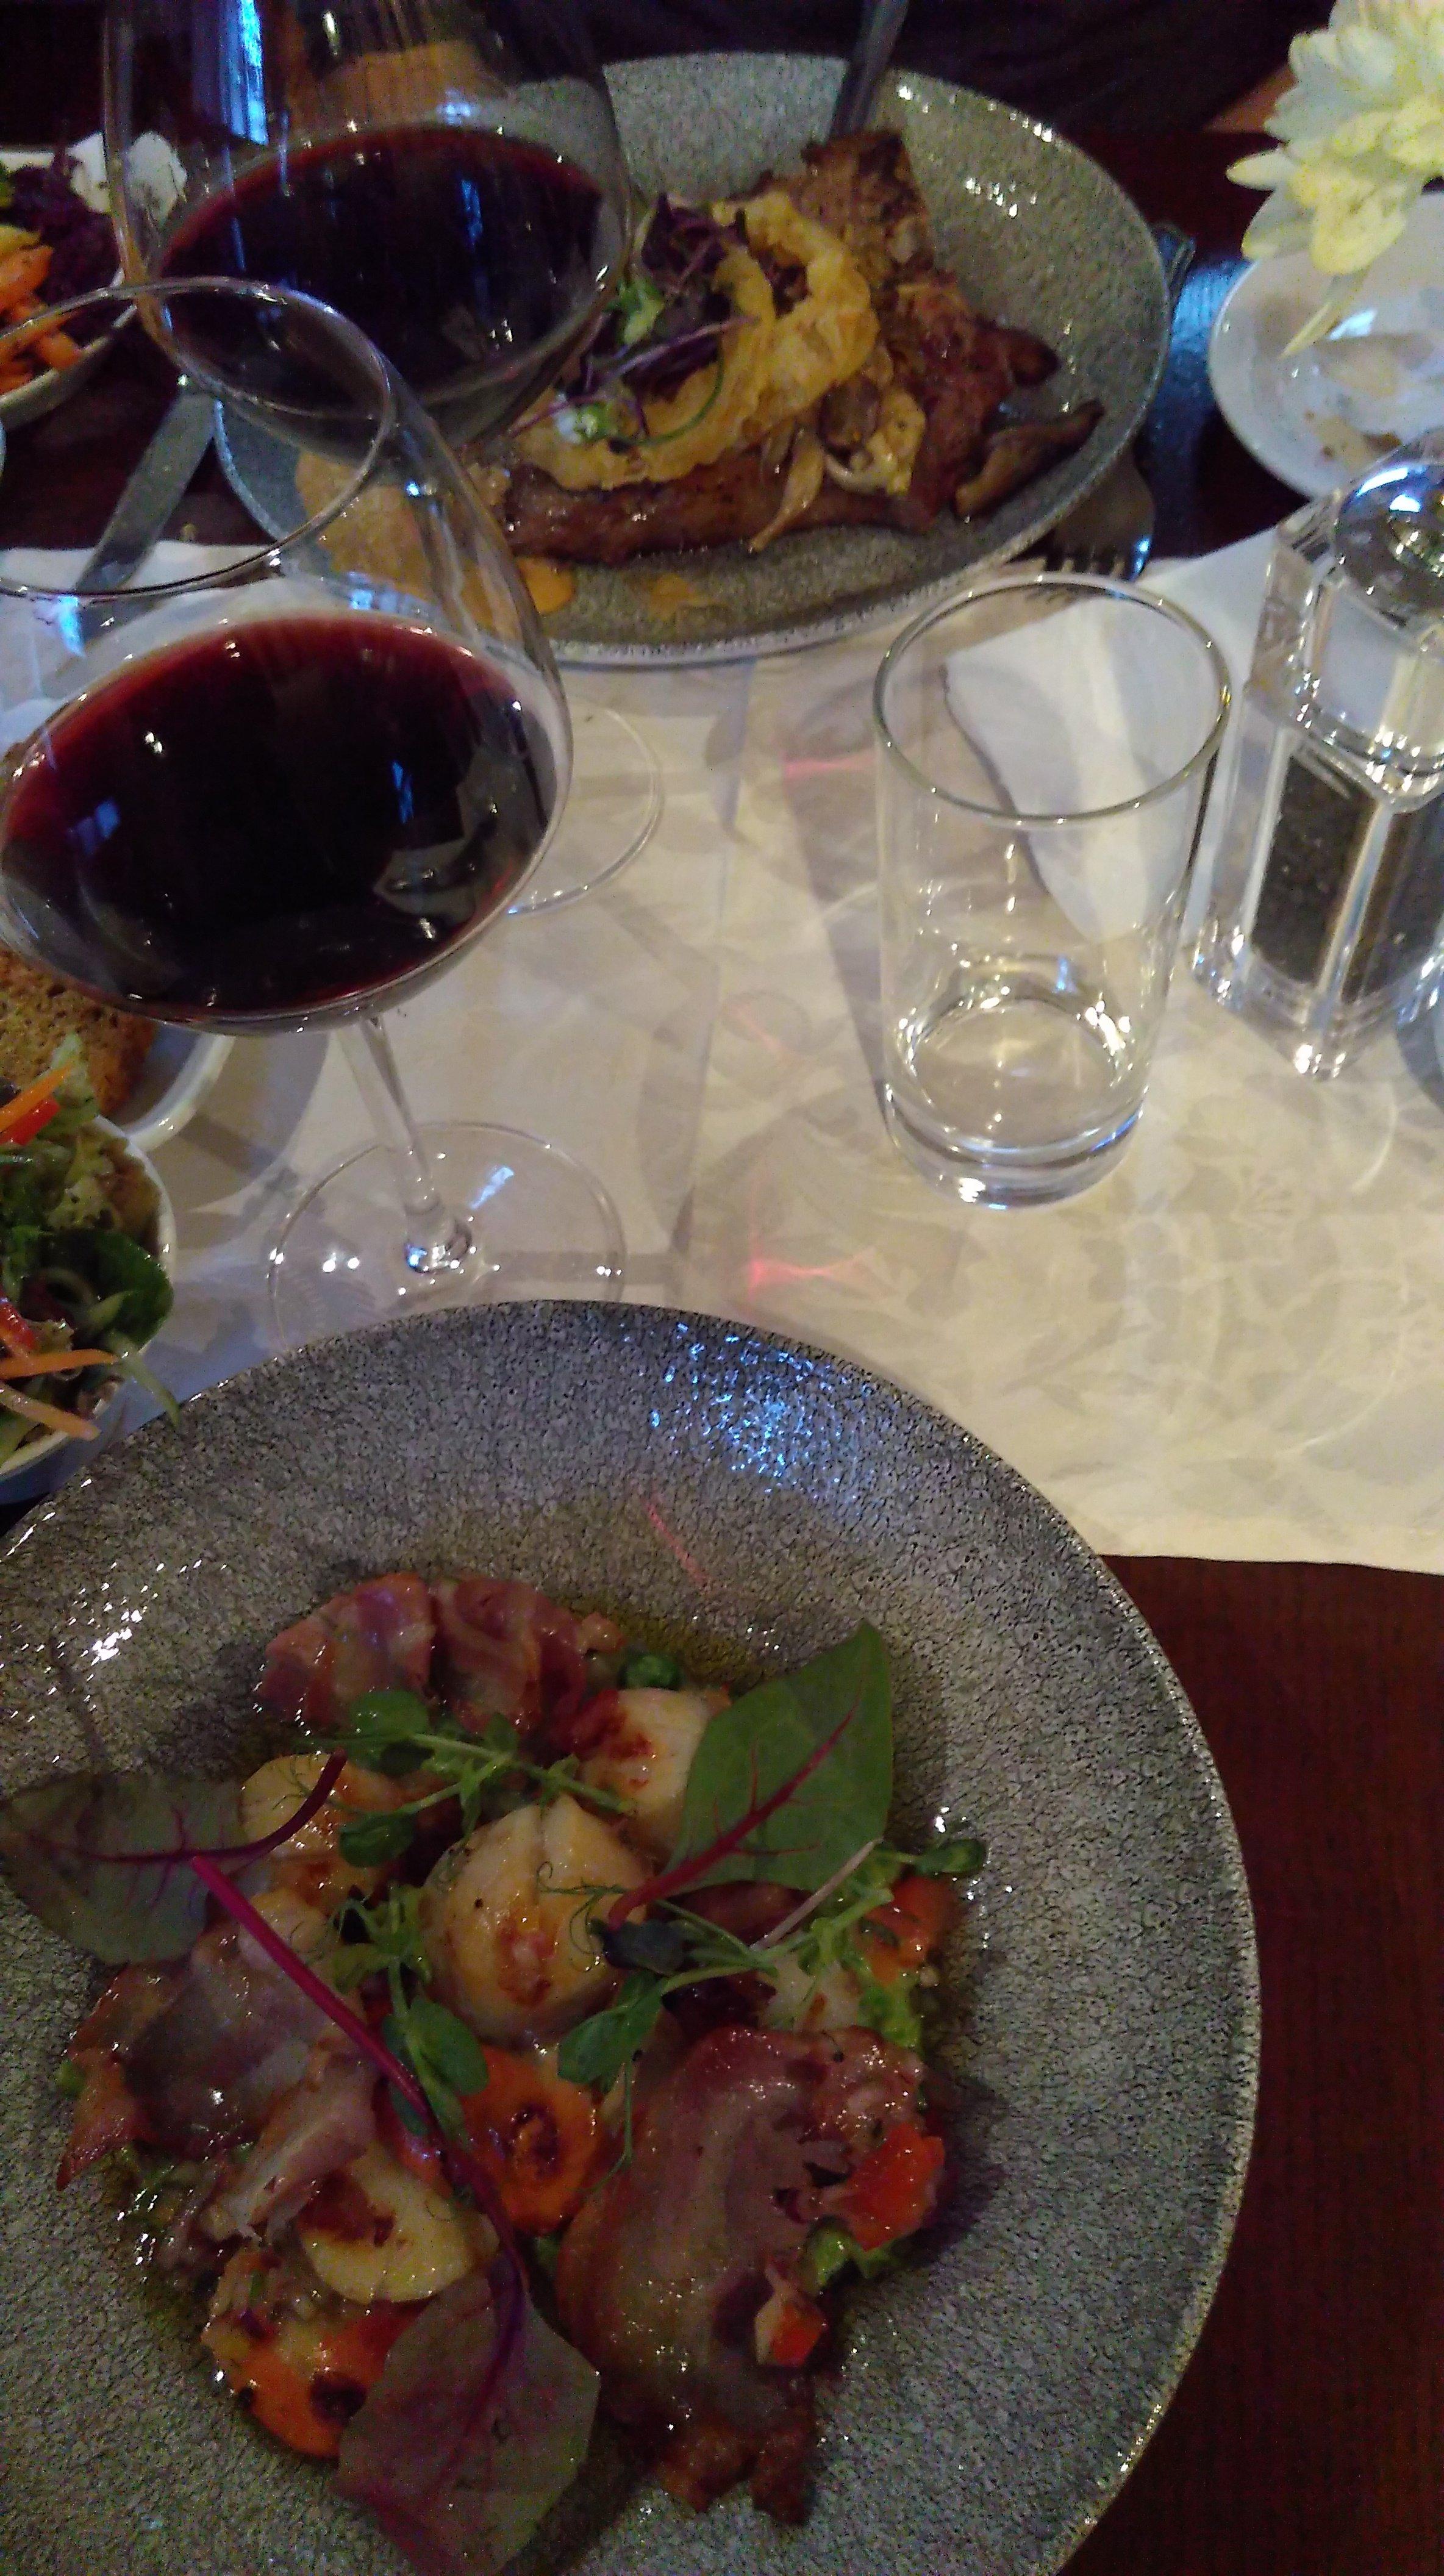 Province of Connacht, Ireland Food Guide: 10 European food Must-Eat Restaurants & Street Food Stalls in Ballinrobe